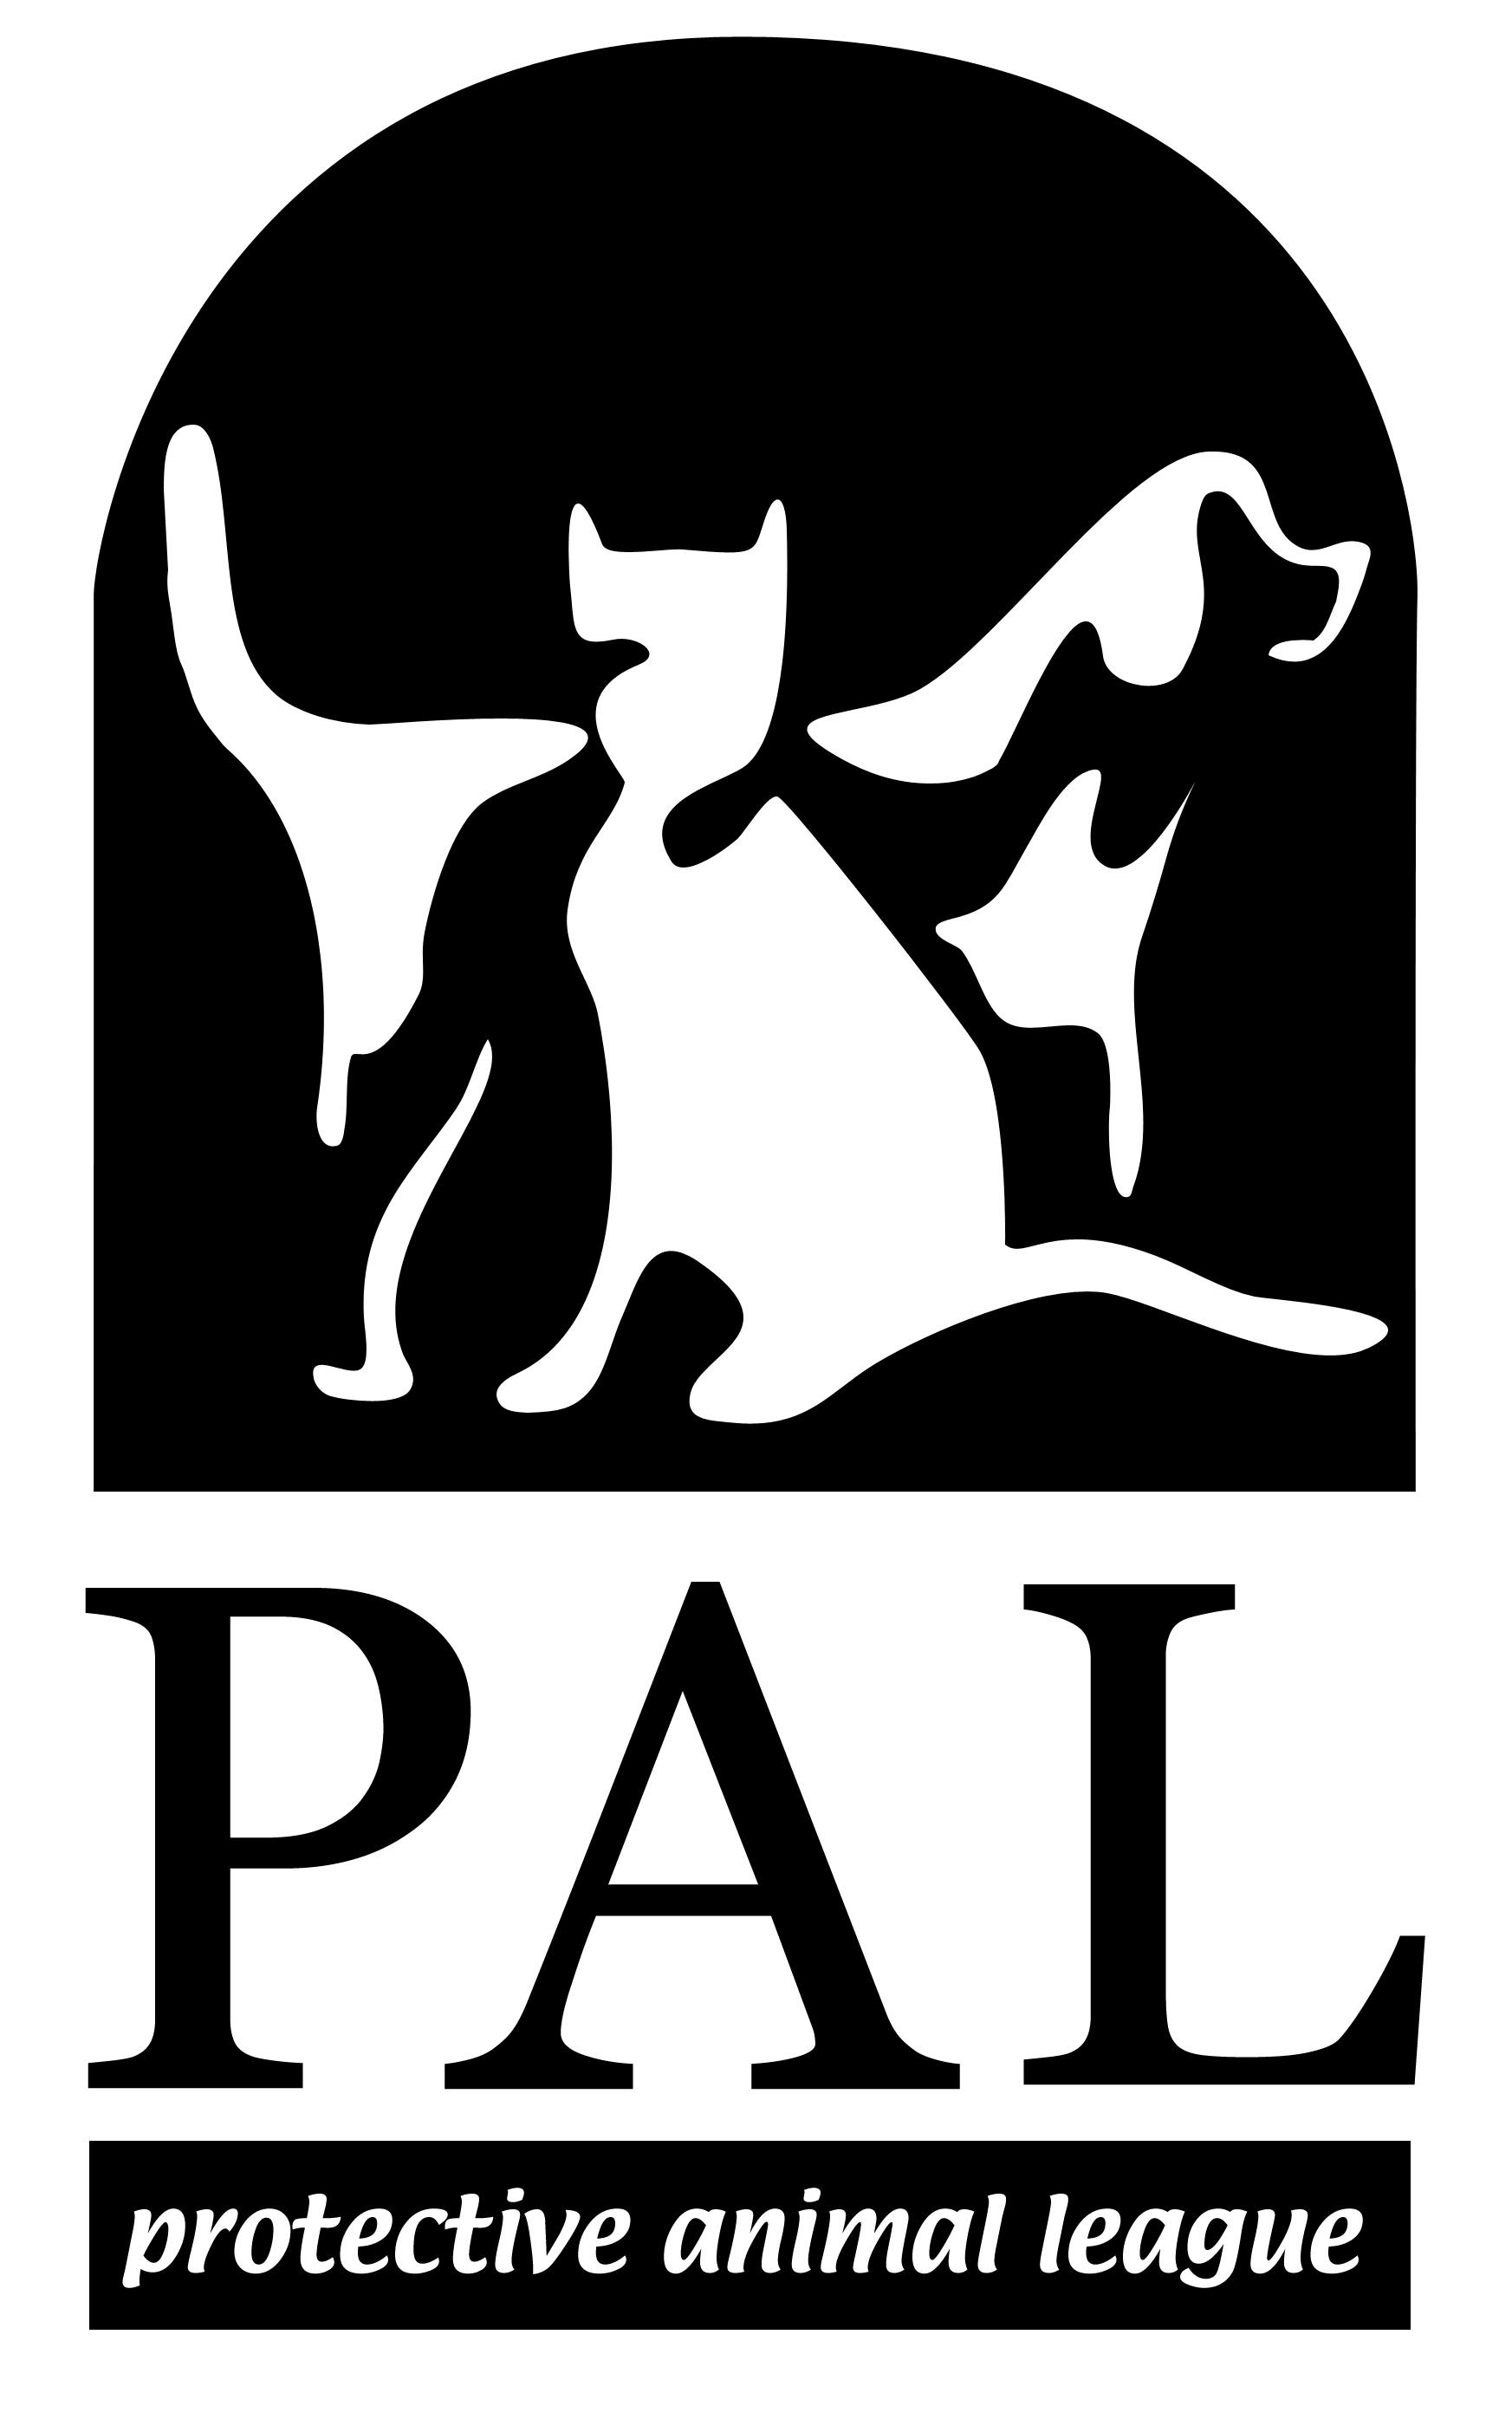 PAL - Protective Animal League